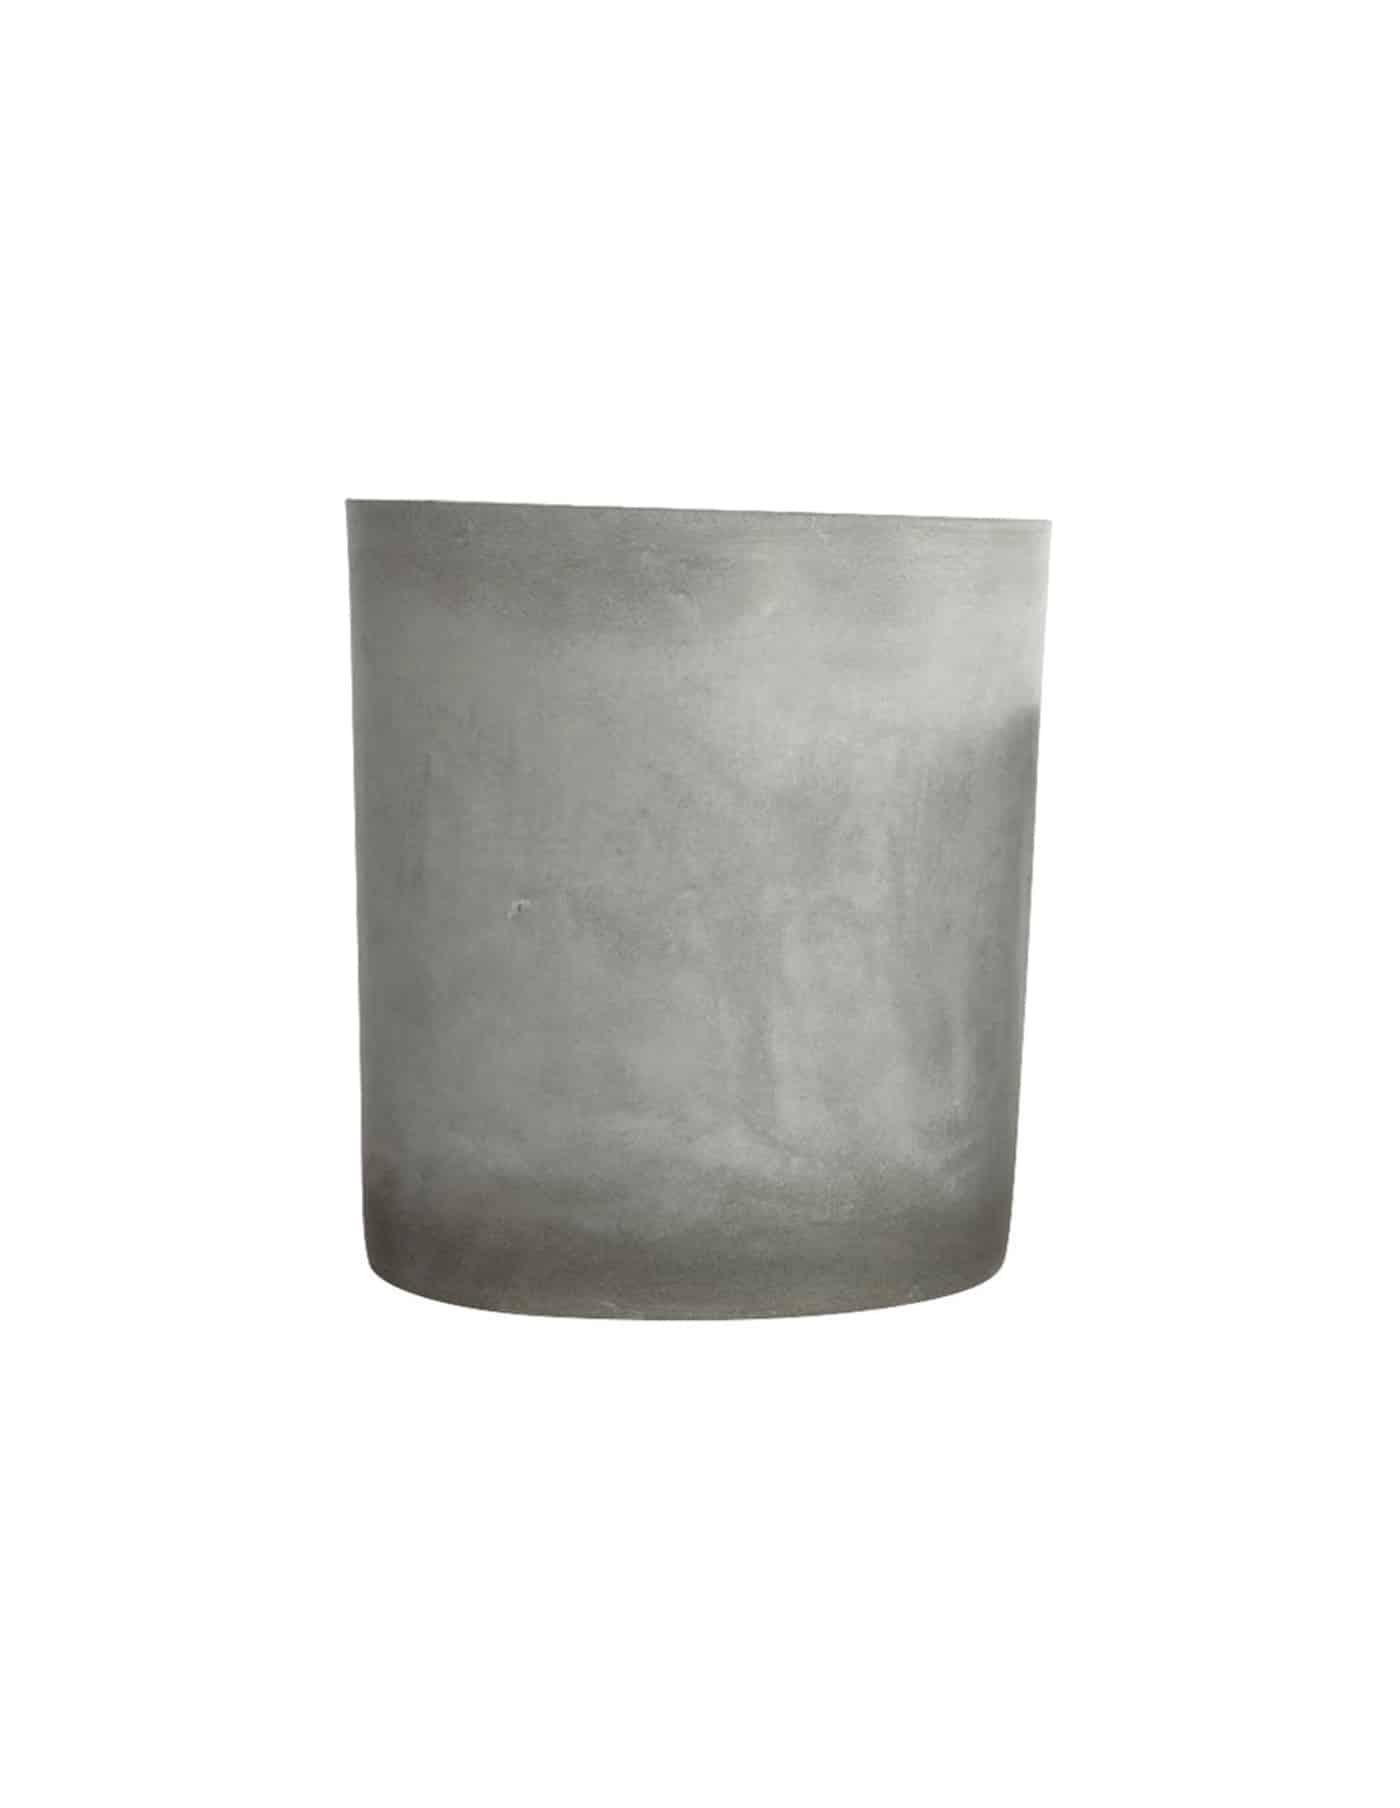 Large Concrete Planter, House Doctor